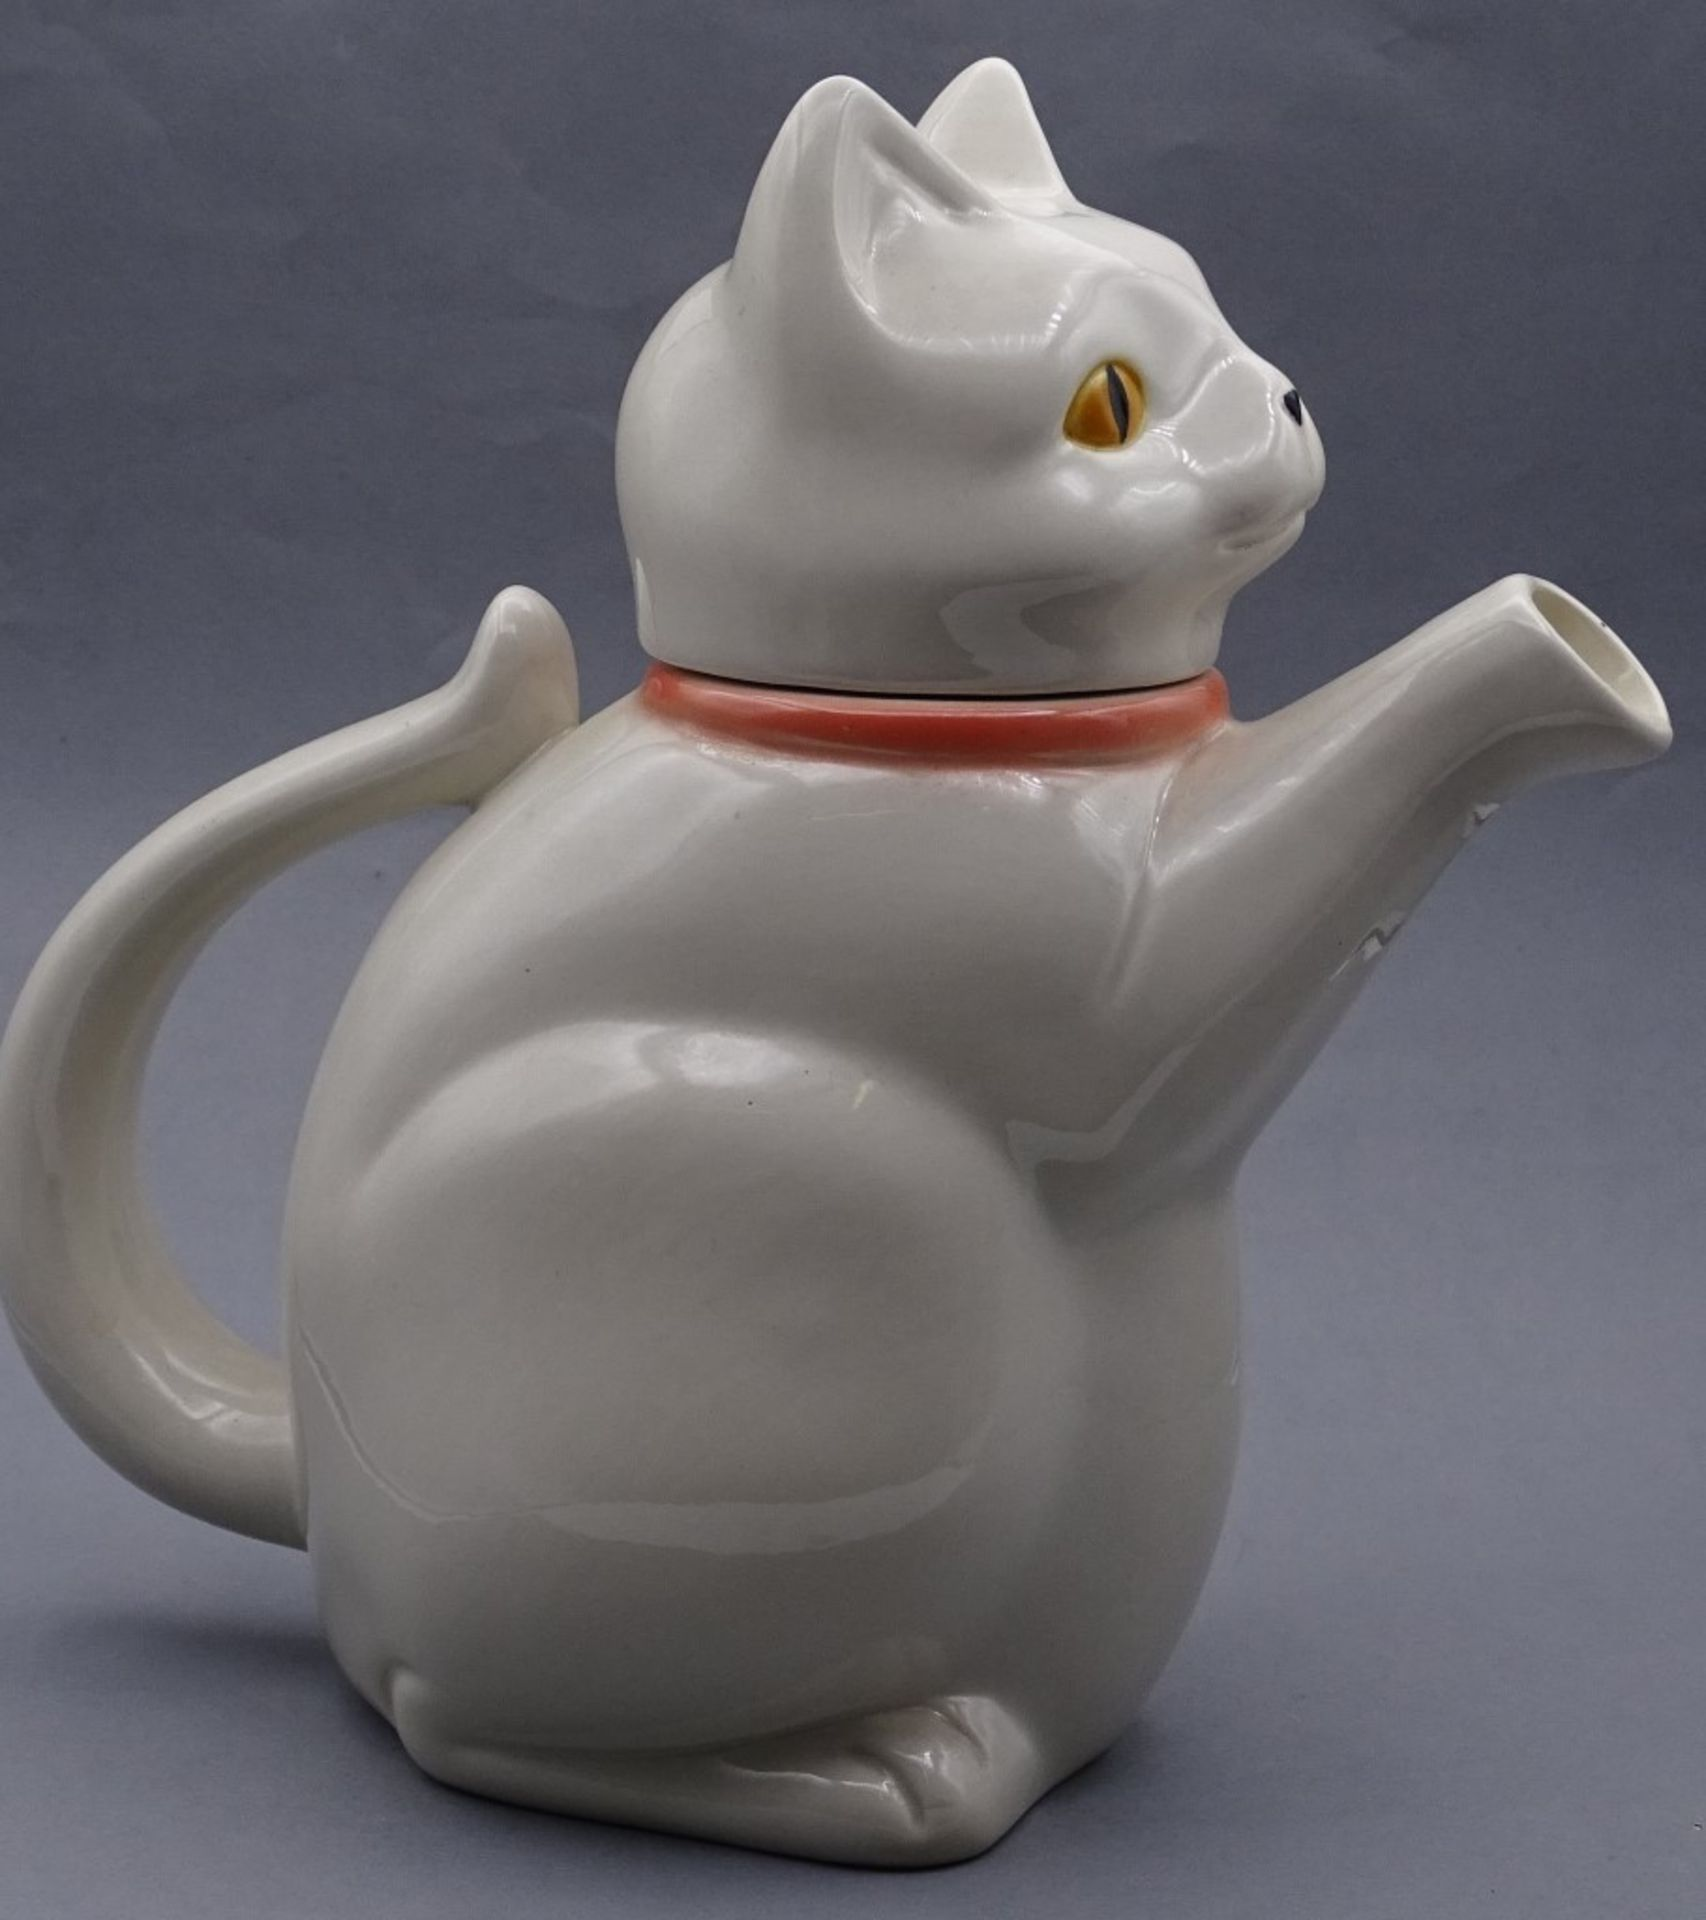 "Goebel Porzellan Kanne ""Katzenkanne""H-22,5cm - Bild 3 aus 5"